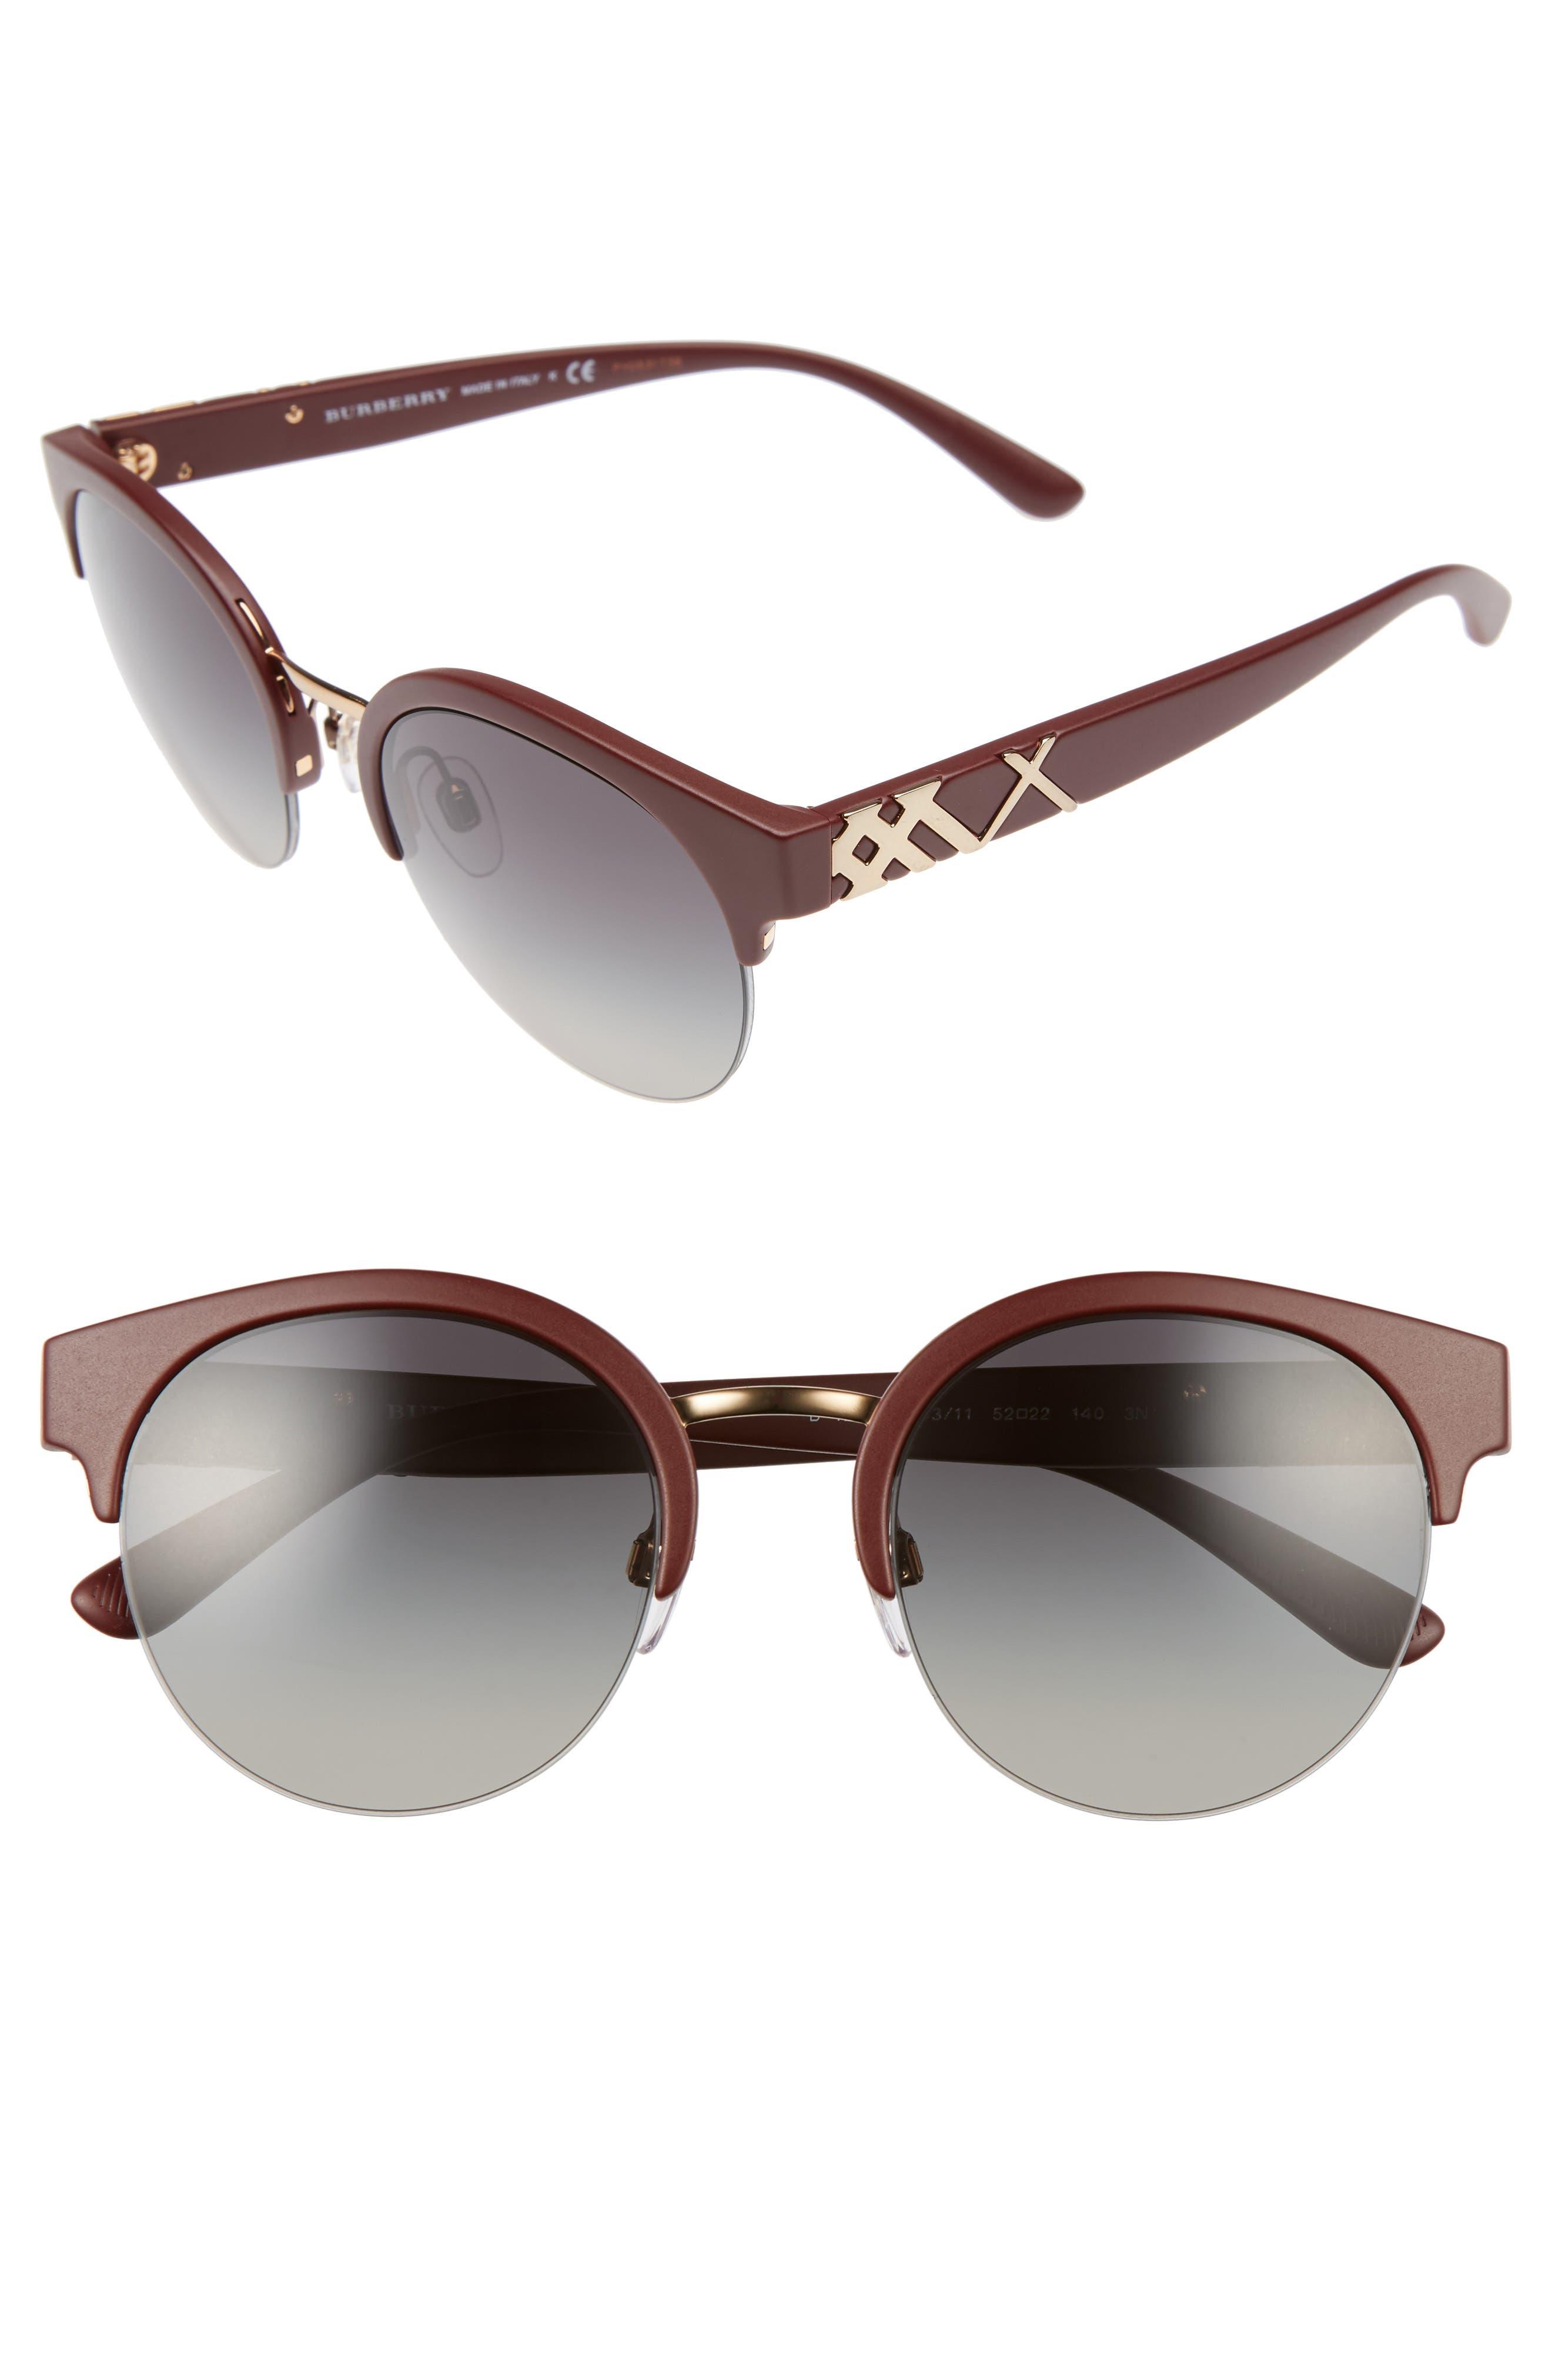 52mm Gradient Semi Rimless Sunglasses,                             Main thumbnail 3, color,